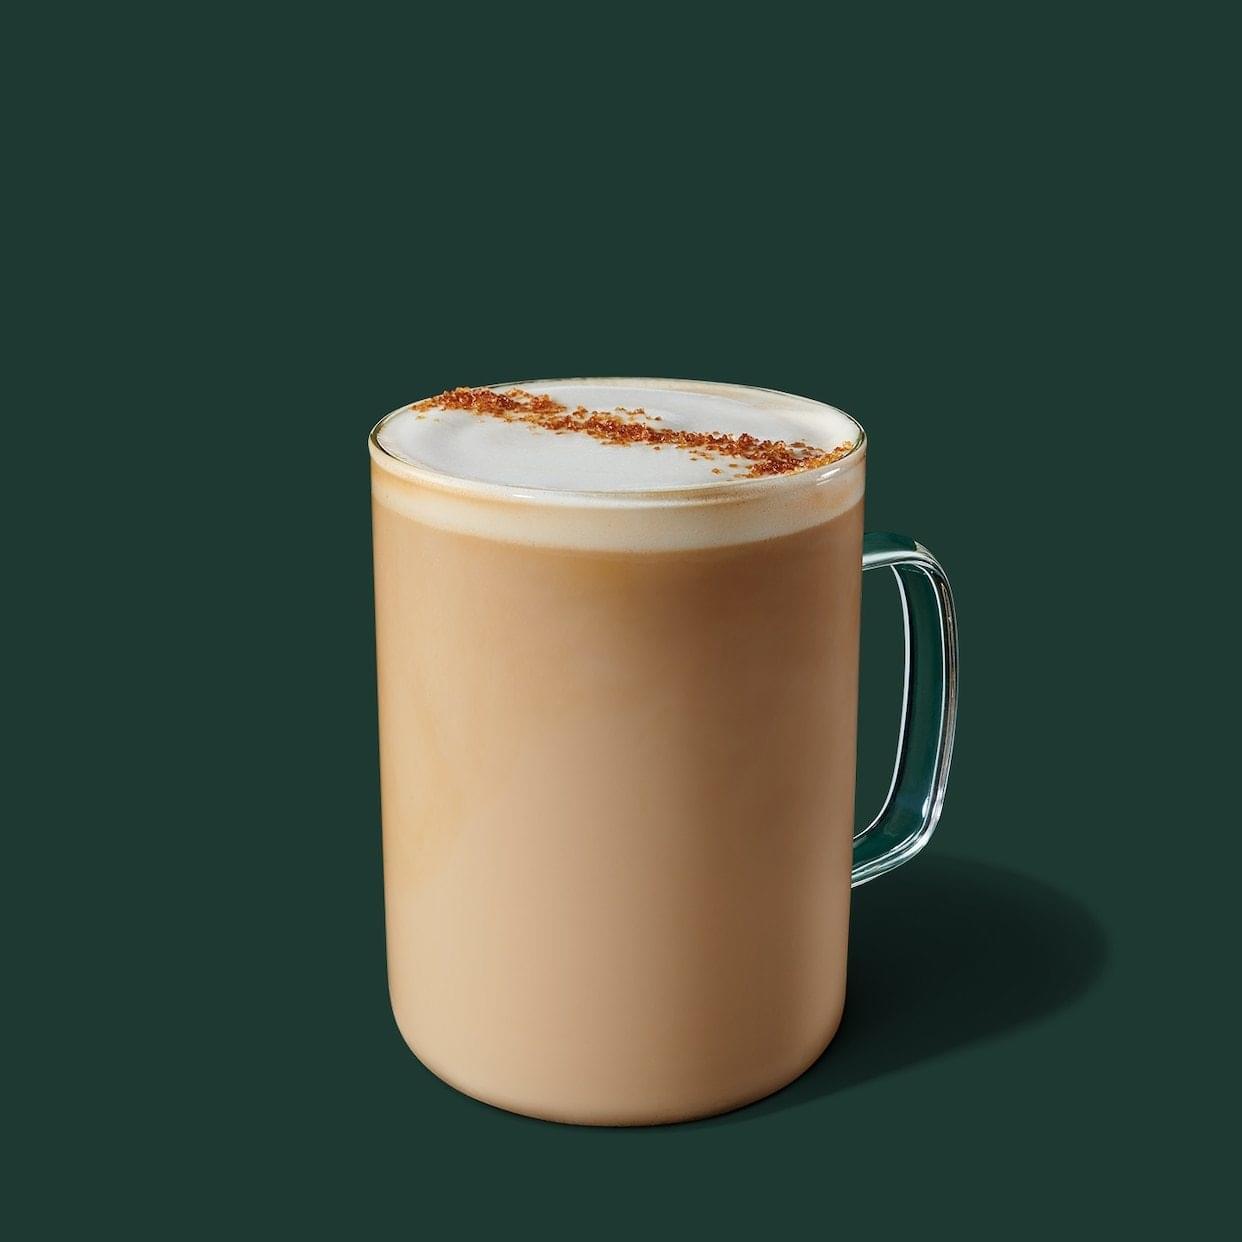 Starbucks Oatmilk Honey Latte Nutrition Facts